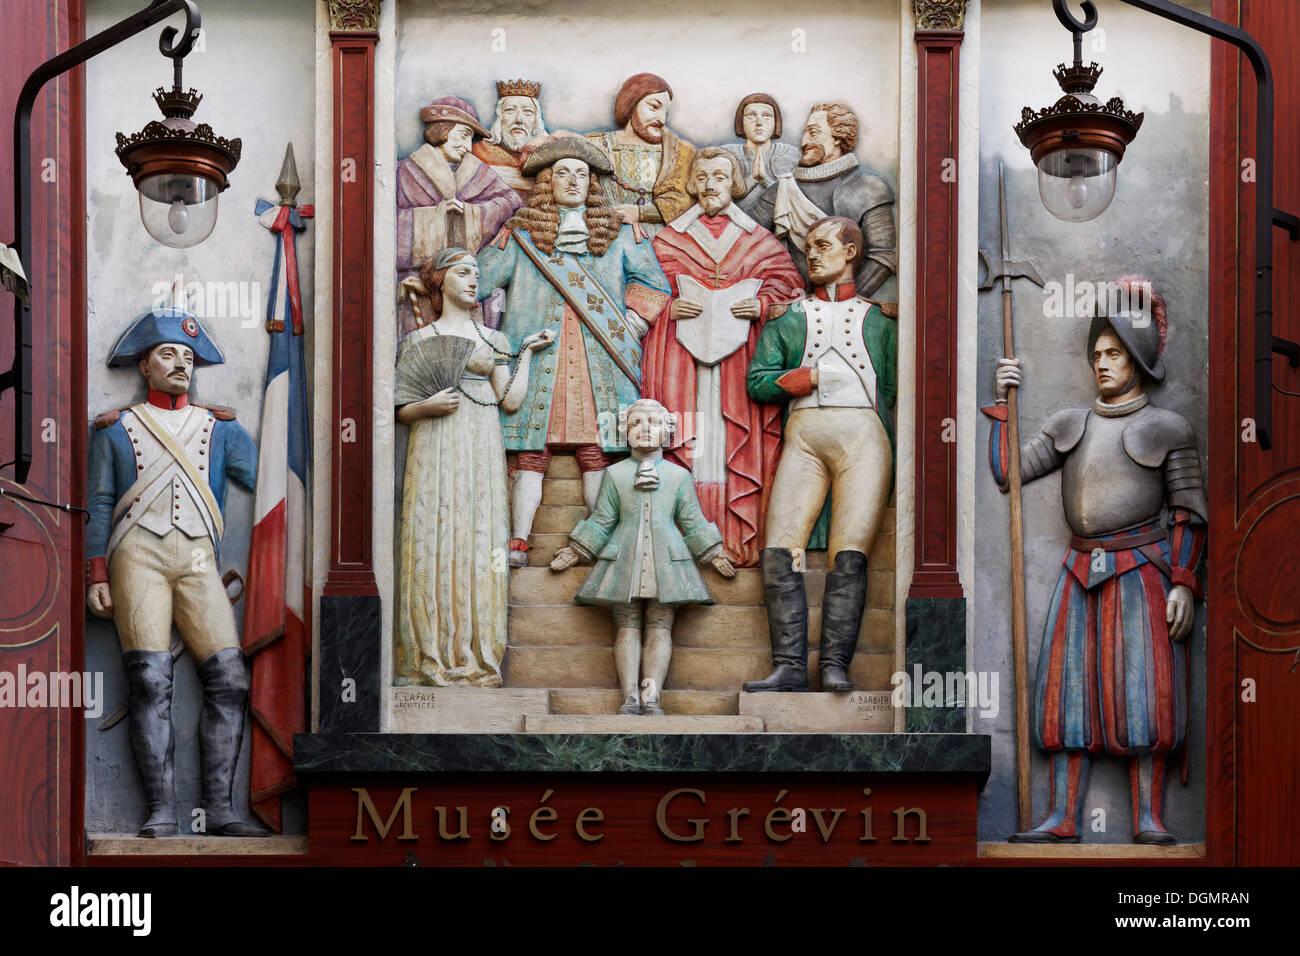 Relief with historical figures, entrance to Musée Grevin waxwork museum, Passage Jouffroy, 9th Arrondissement, Paris - Stock Image